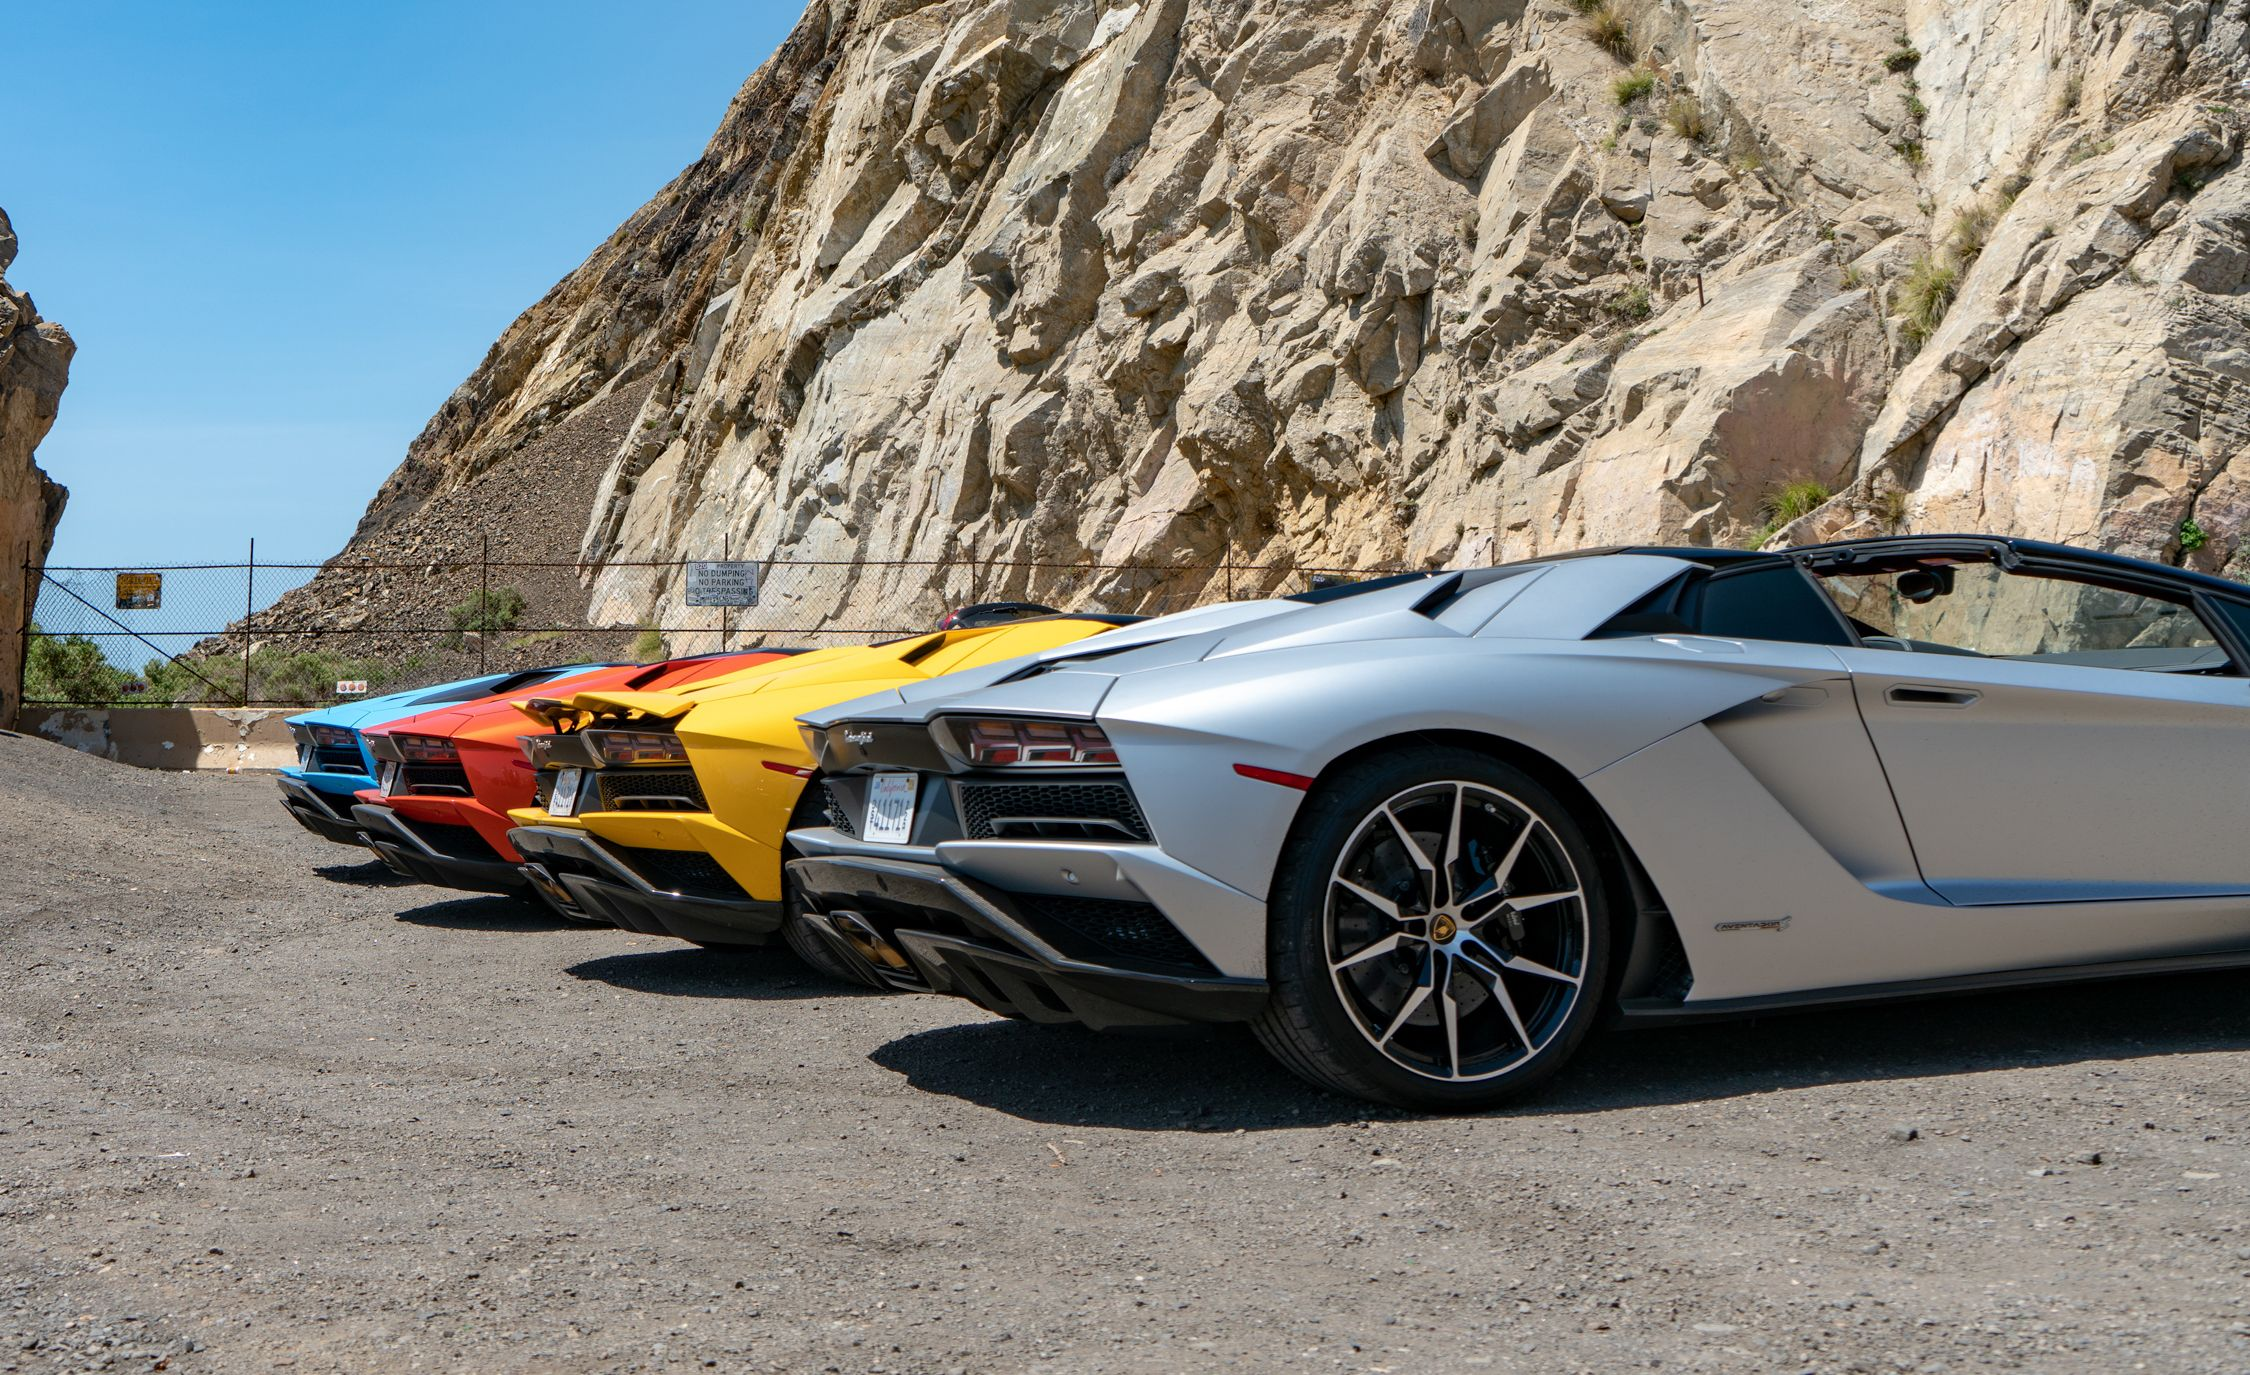 2019 Lamborghini Aventador Reviews Lamborghini Aventador Price